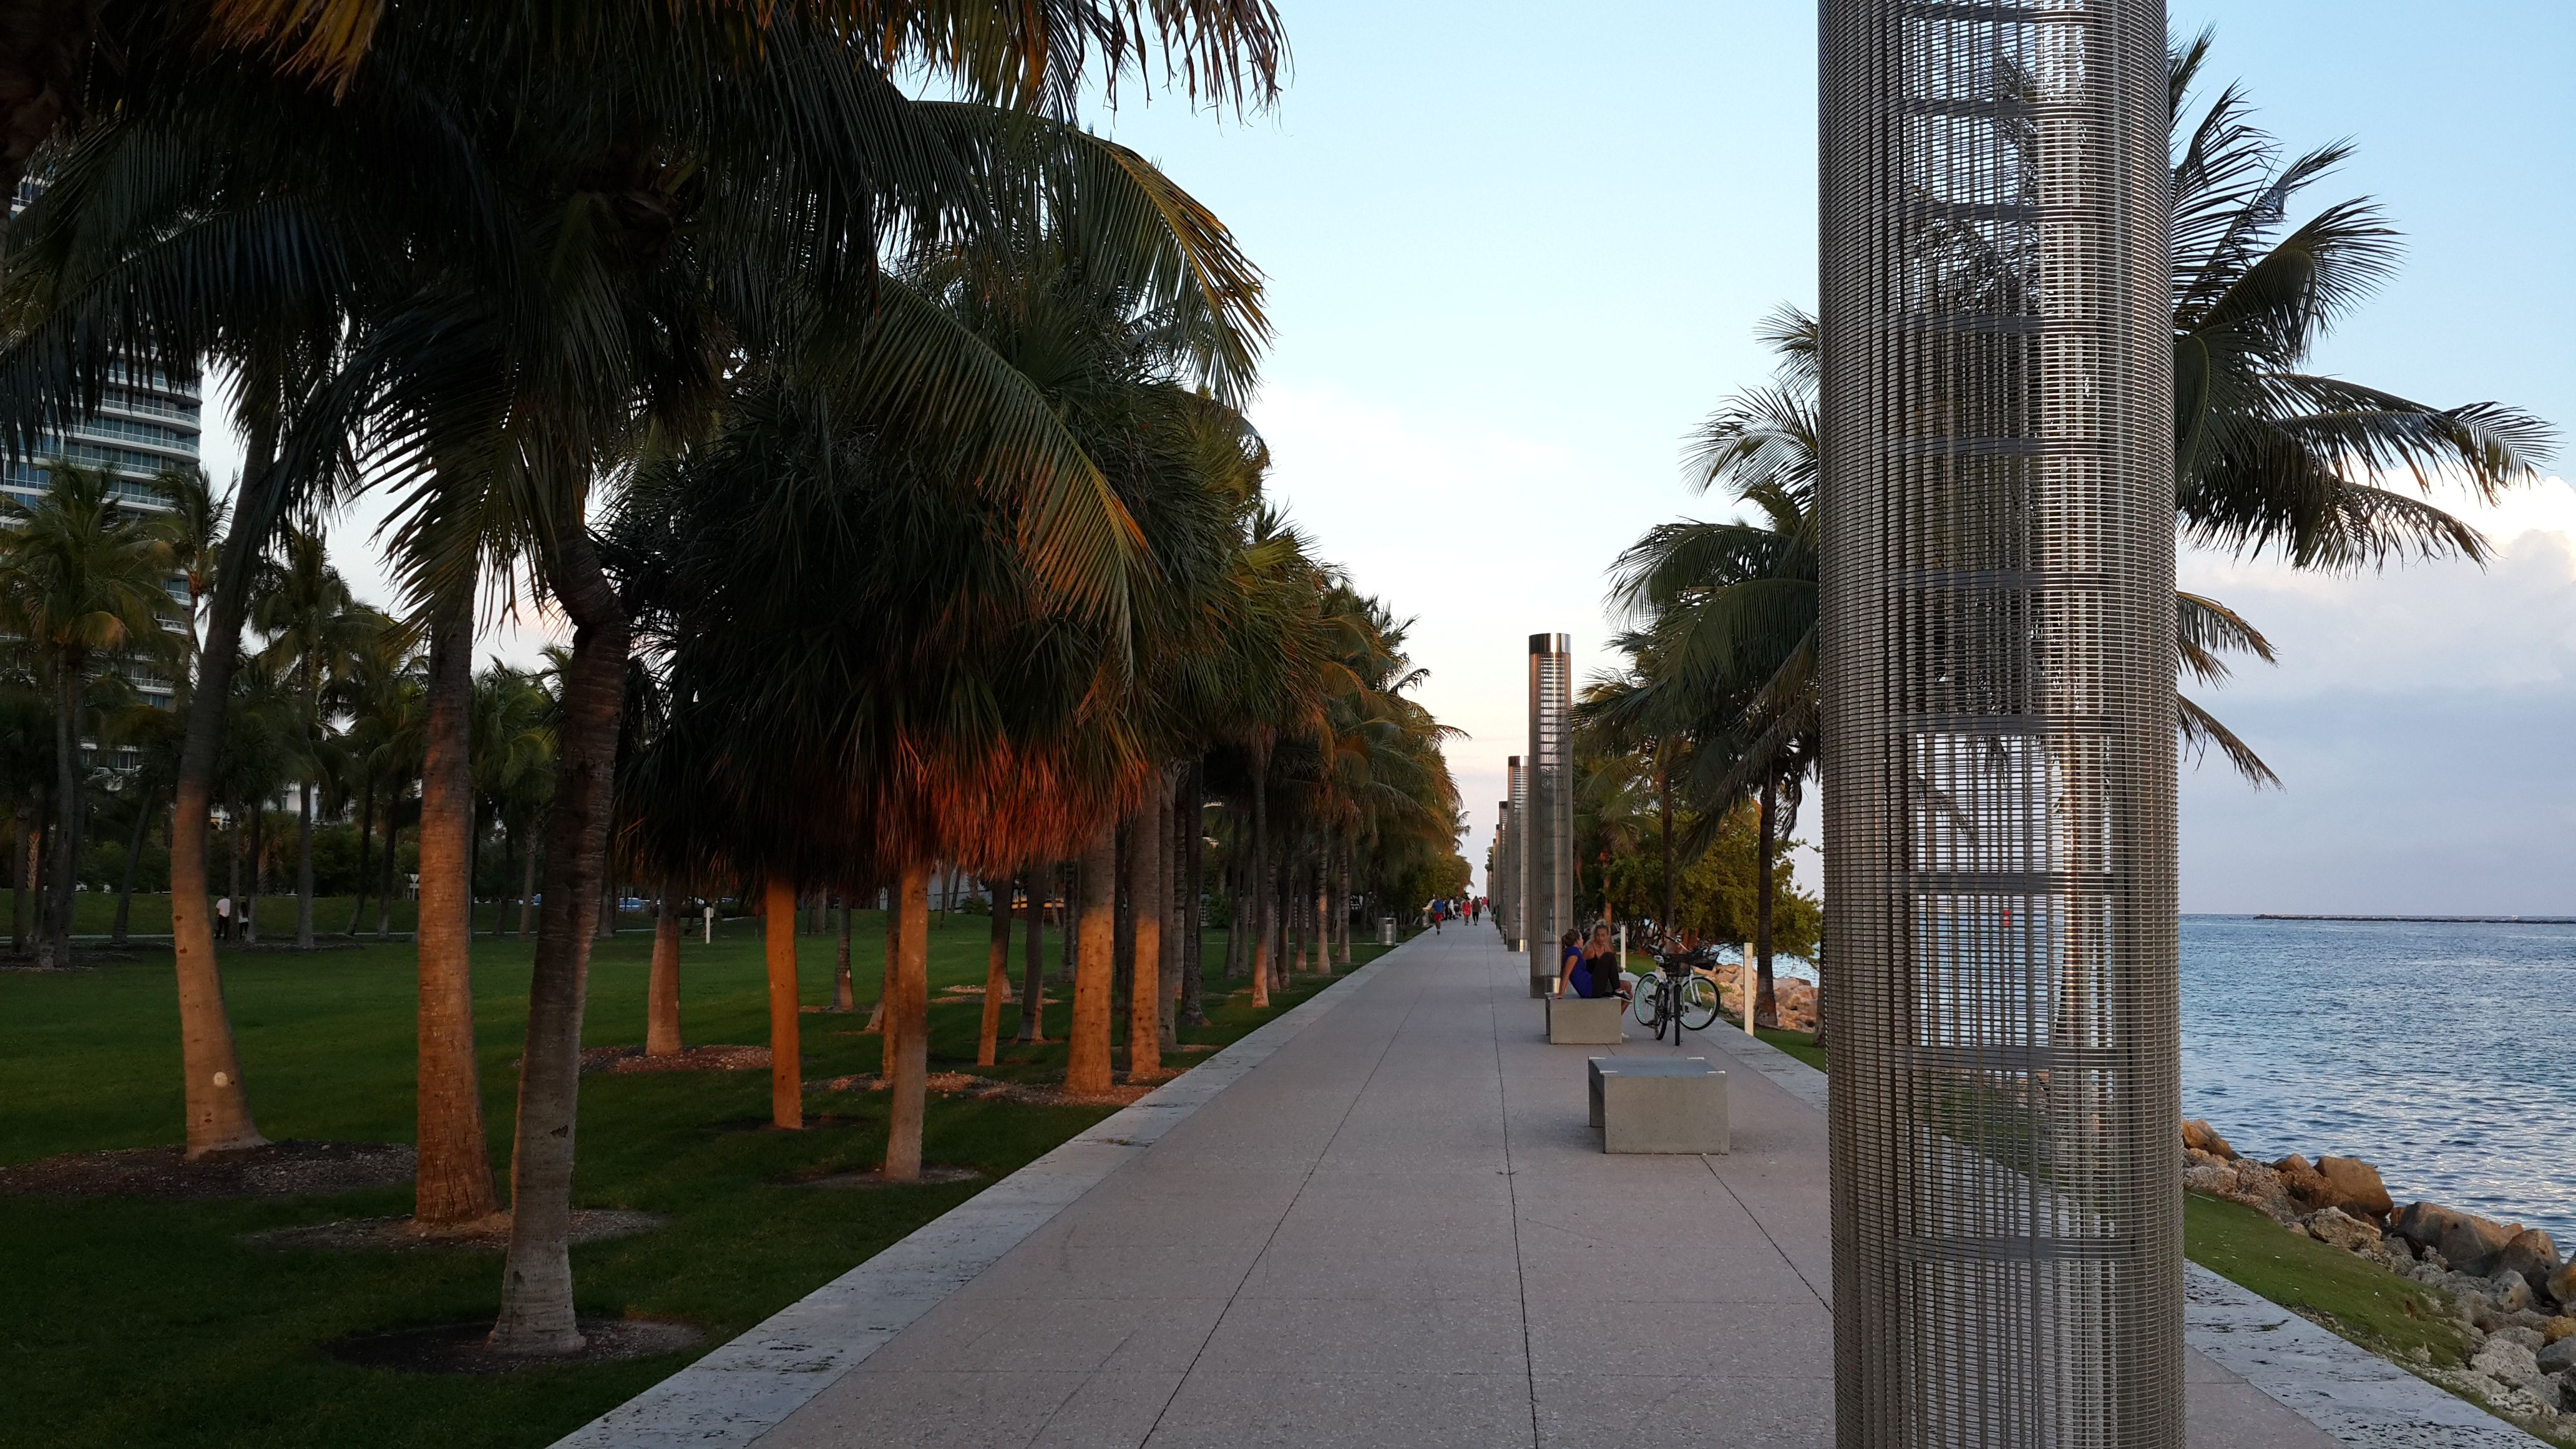 South Pointe Park Outdoor, Park, Sidewalk